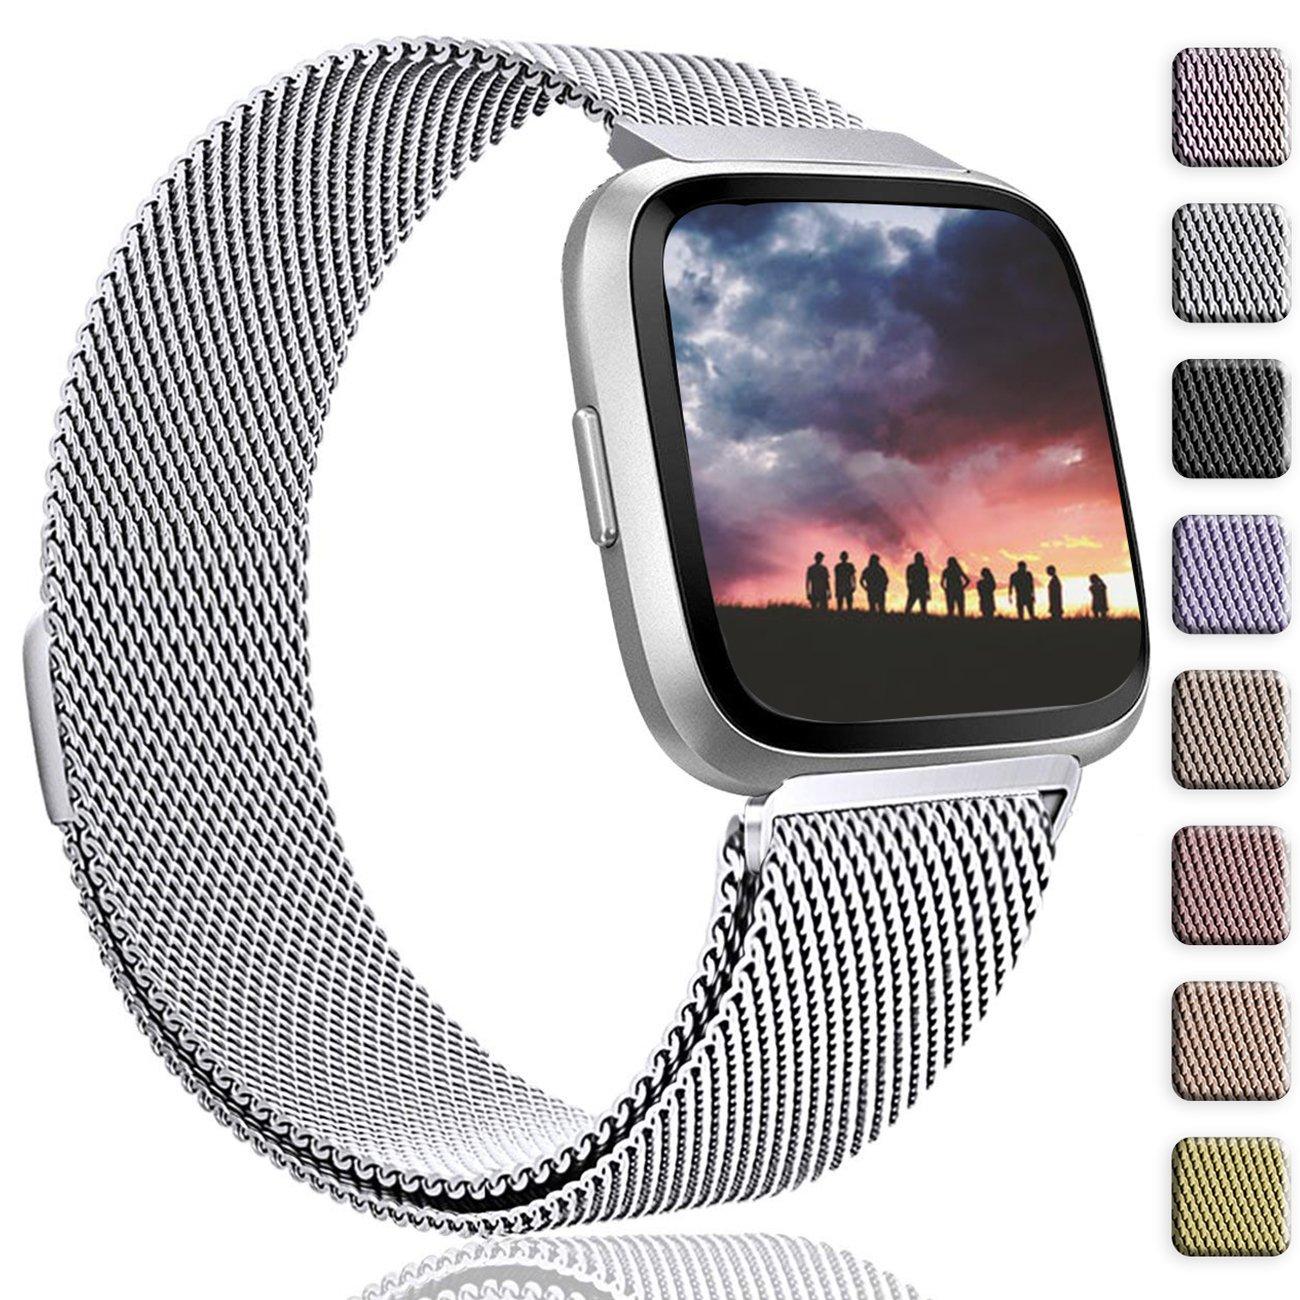 Wepro Fitbit Versaバンド交換用forレディースメンズSmall Large , Milanese Loopステンレススチールメタルブレスレットストラップwith UniqueマグネットロックアクセサリーWristbands for Fitbit Versa Smart Watch B07BLSHT5T Large 6.7